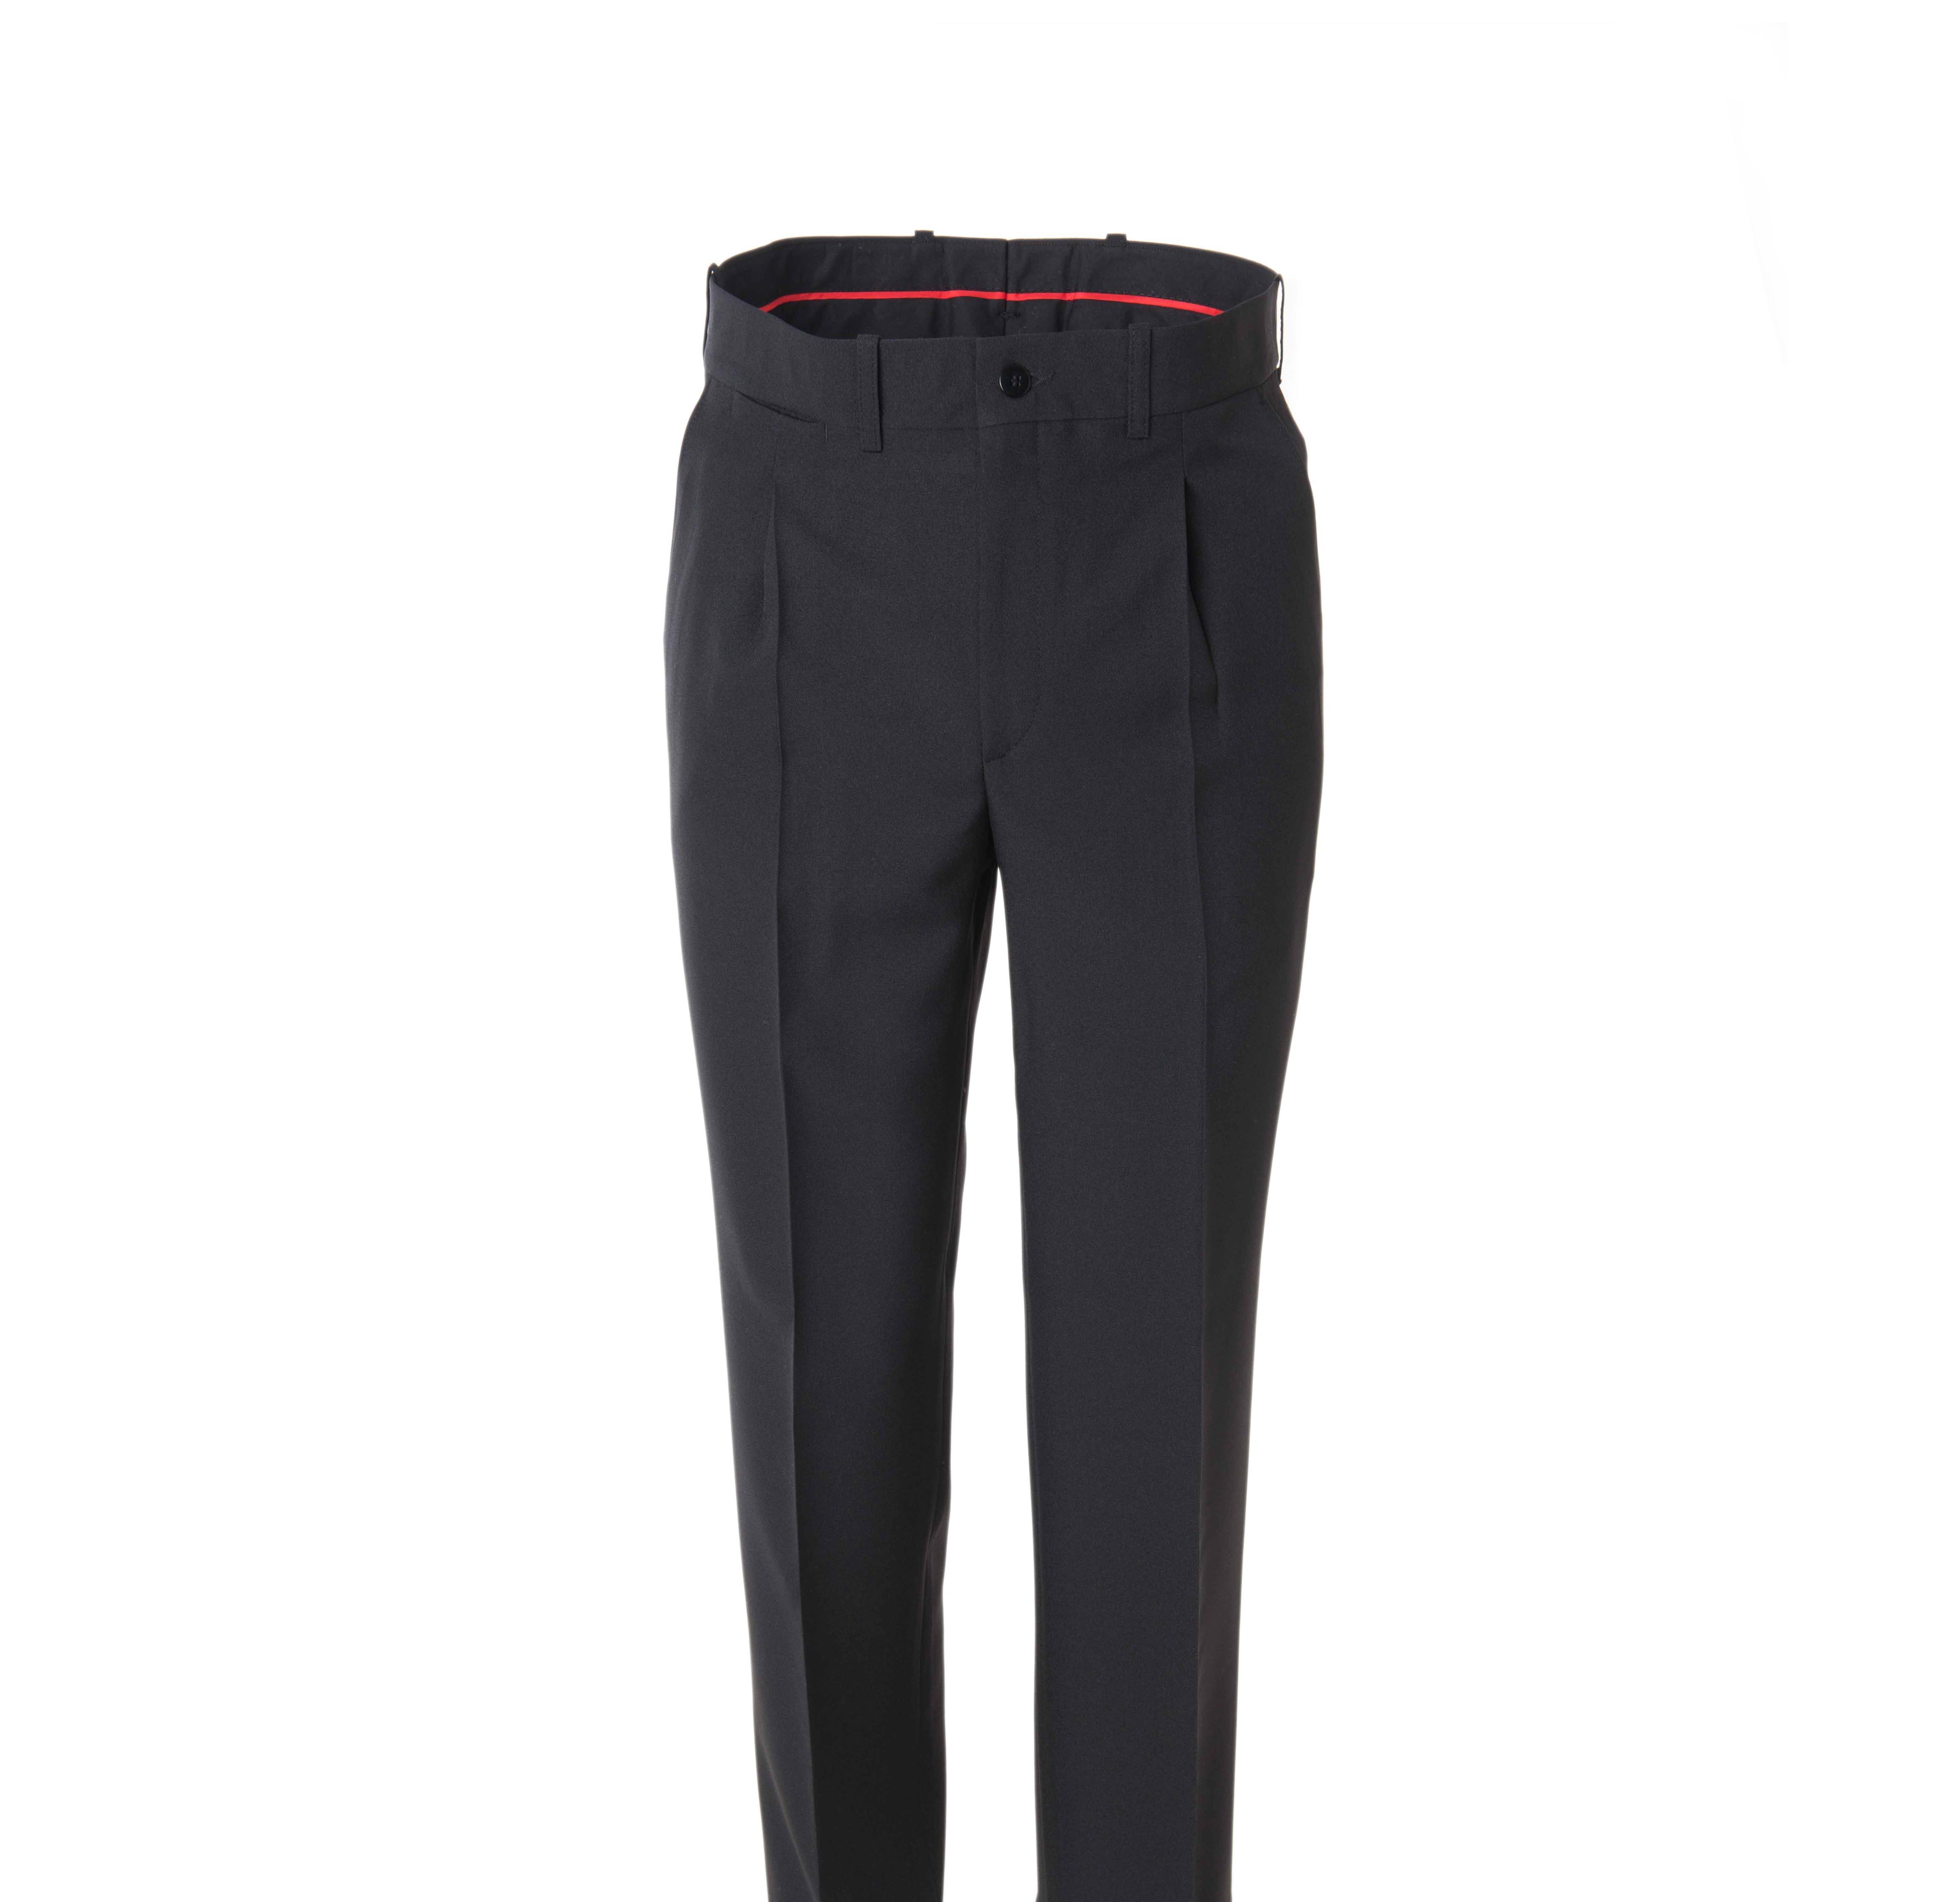 Pantalones Blaper Camarero Pinzas Vestir Negro Pantalón xwIqHXq 1dd88b1a43f